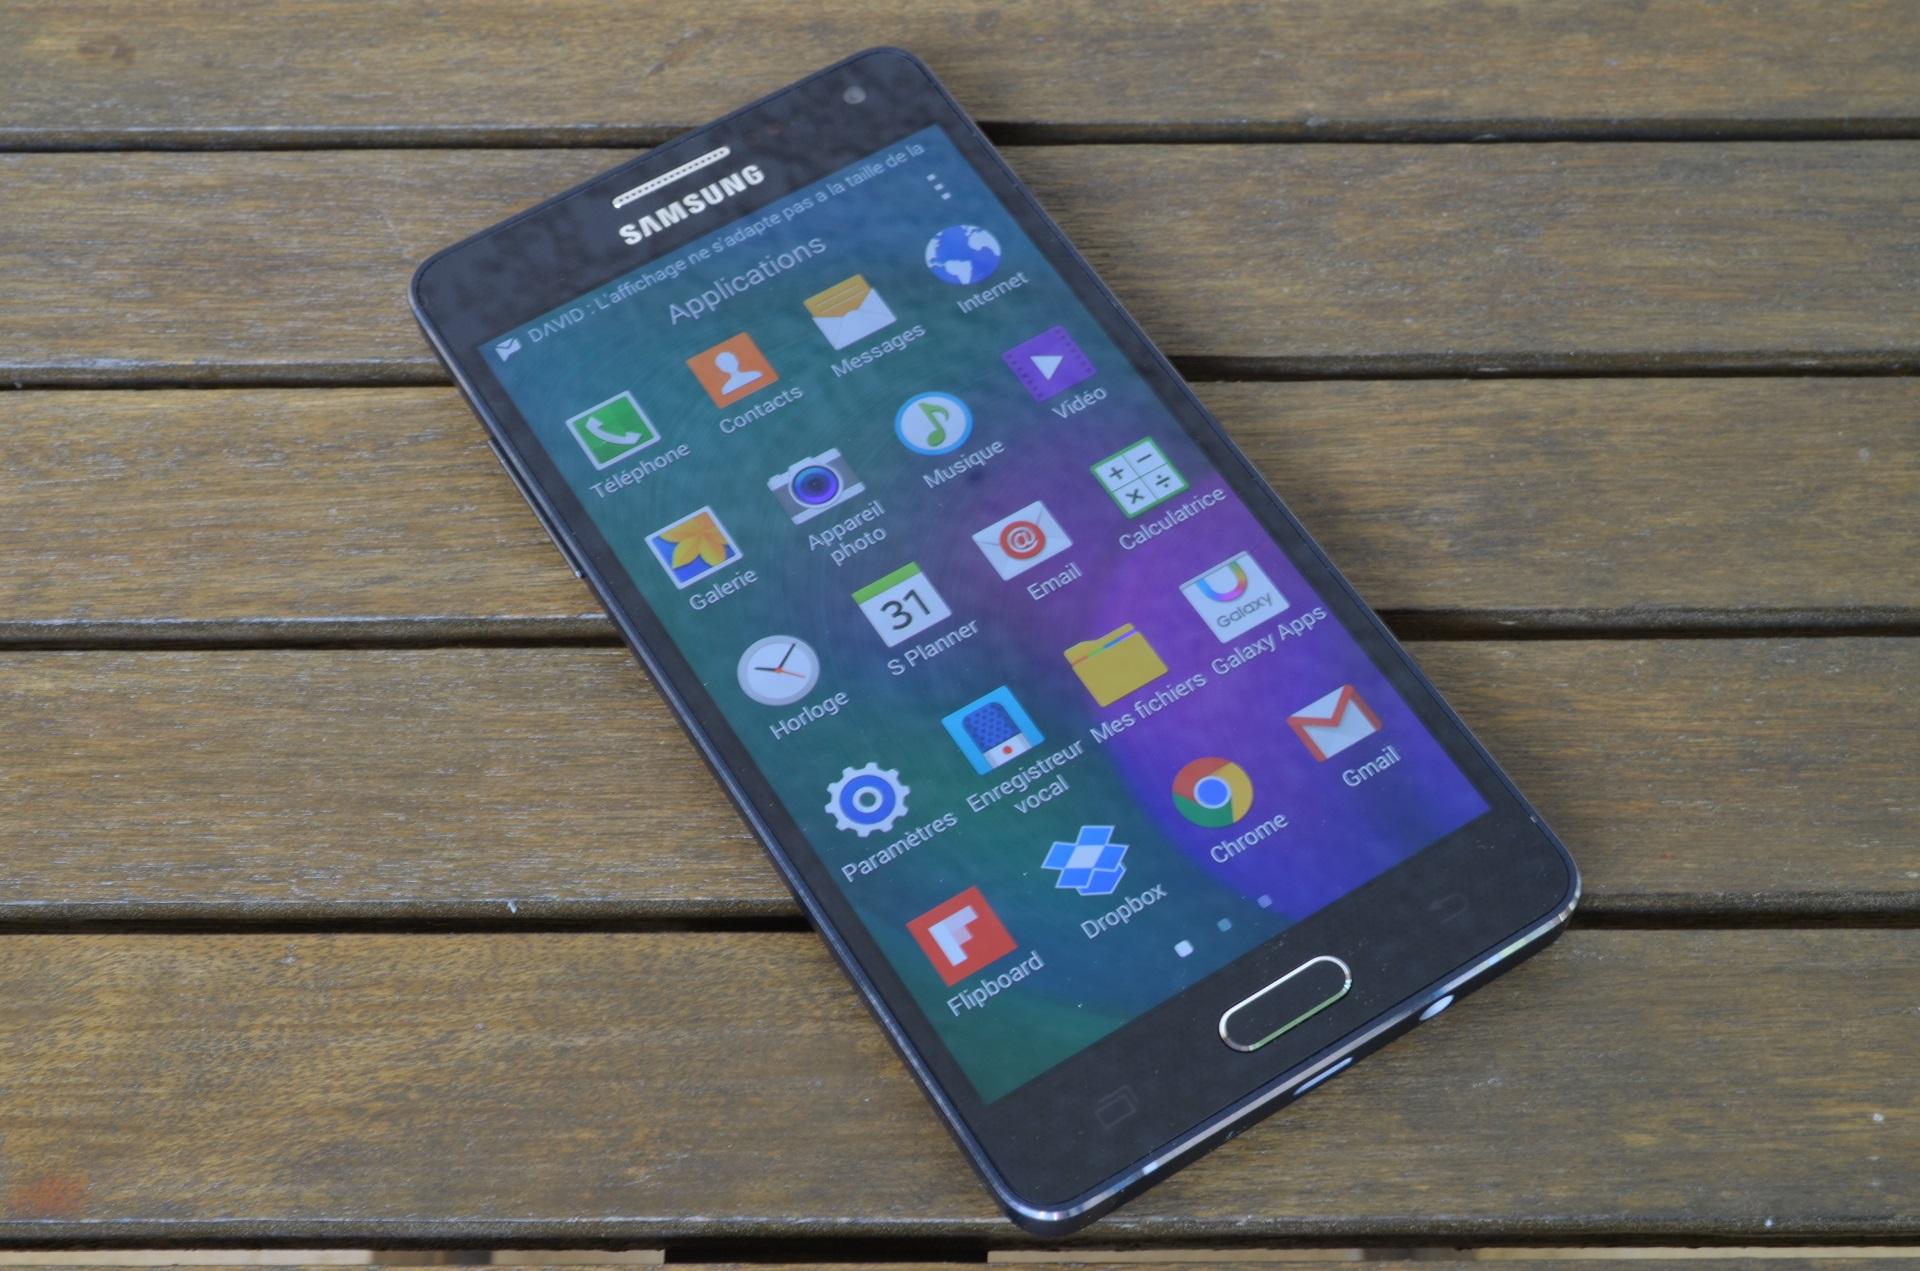 Samsung_A5 (10)